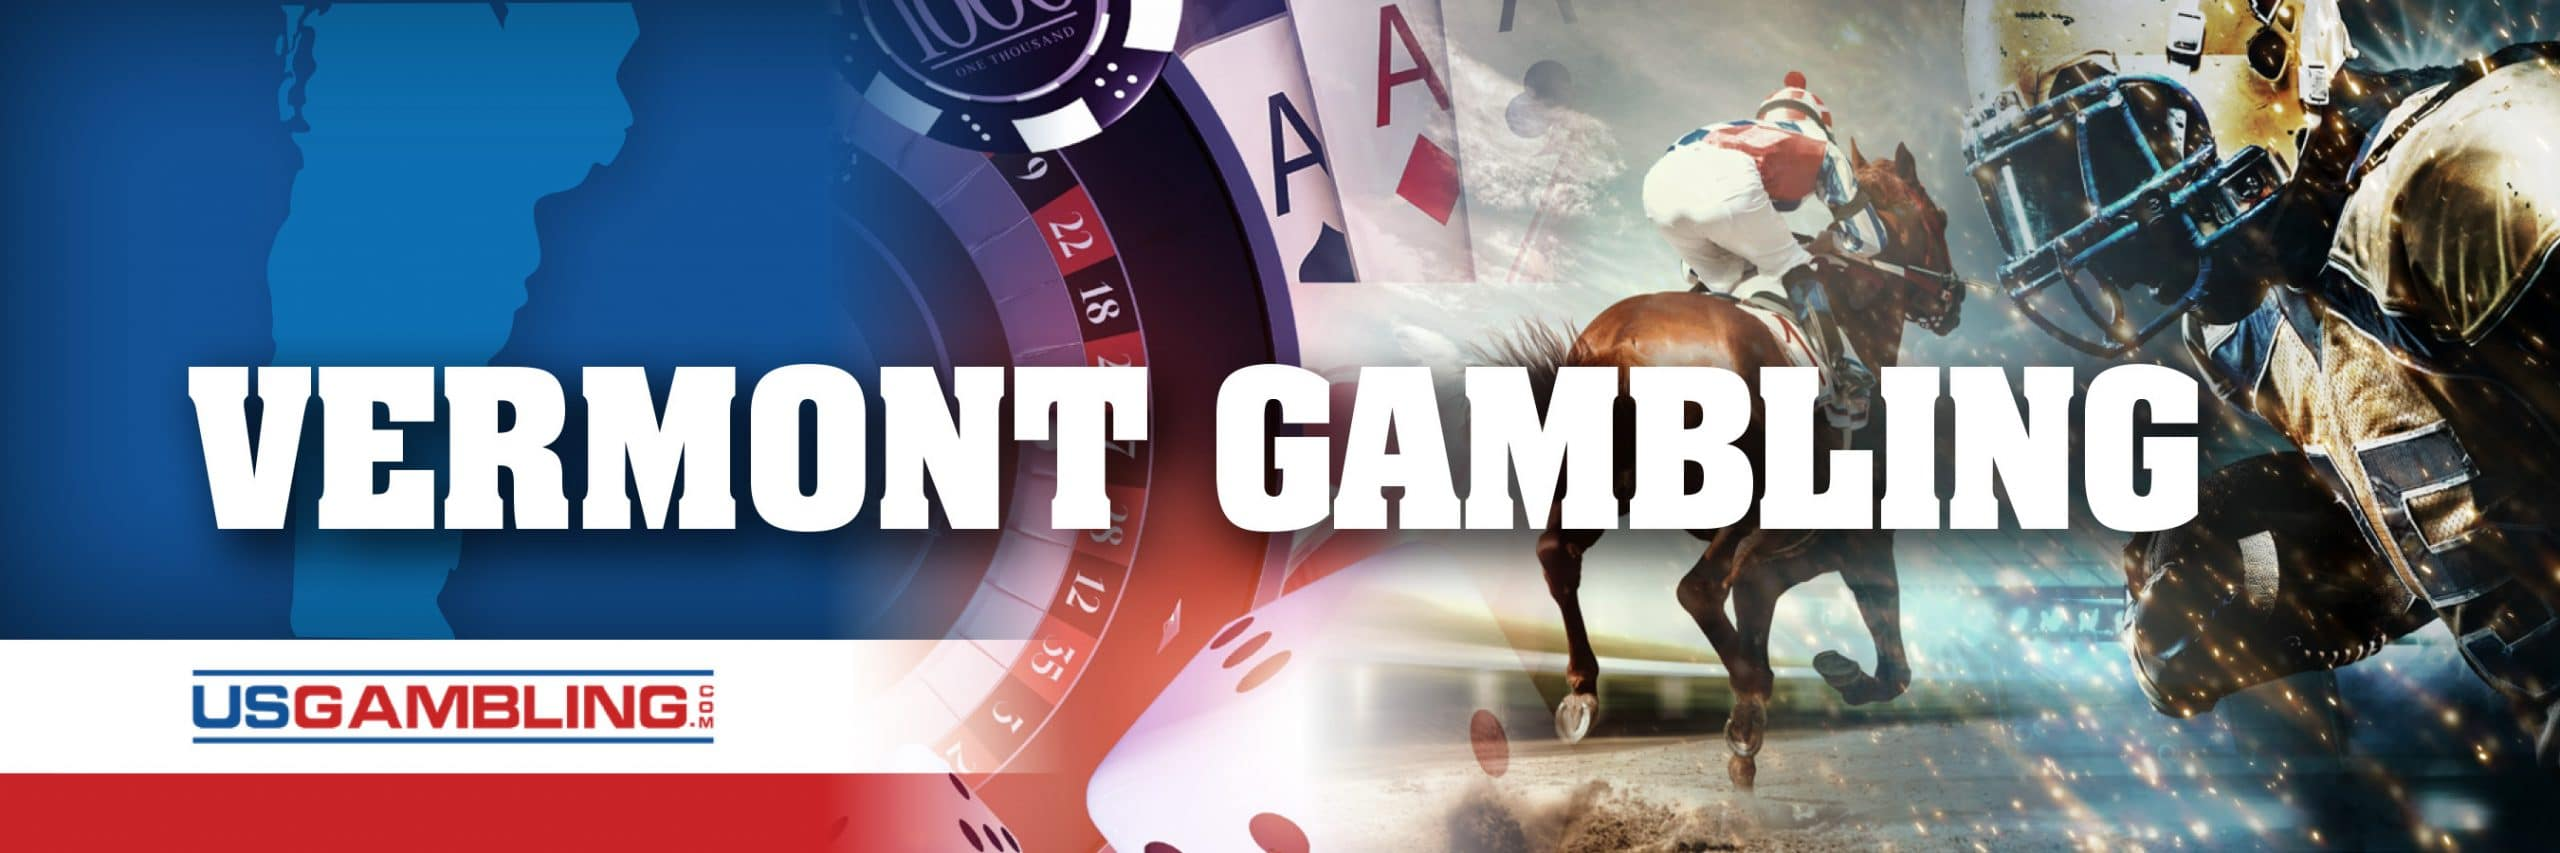 Legal Vermont Gambling